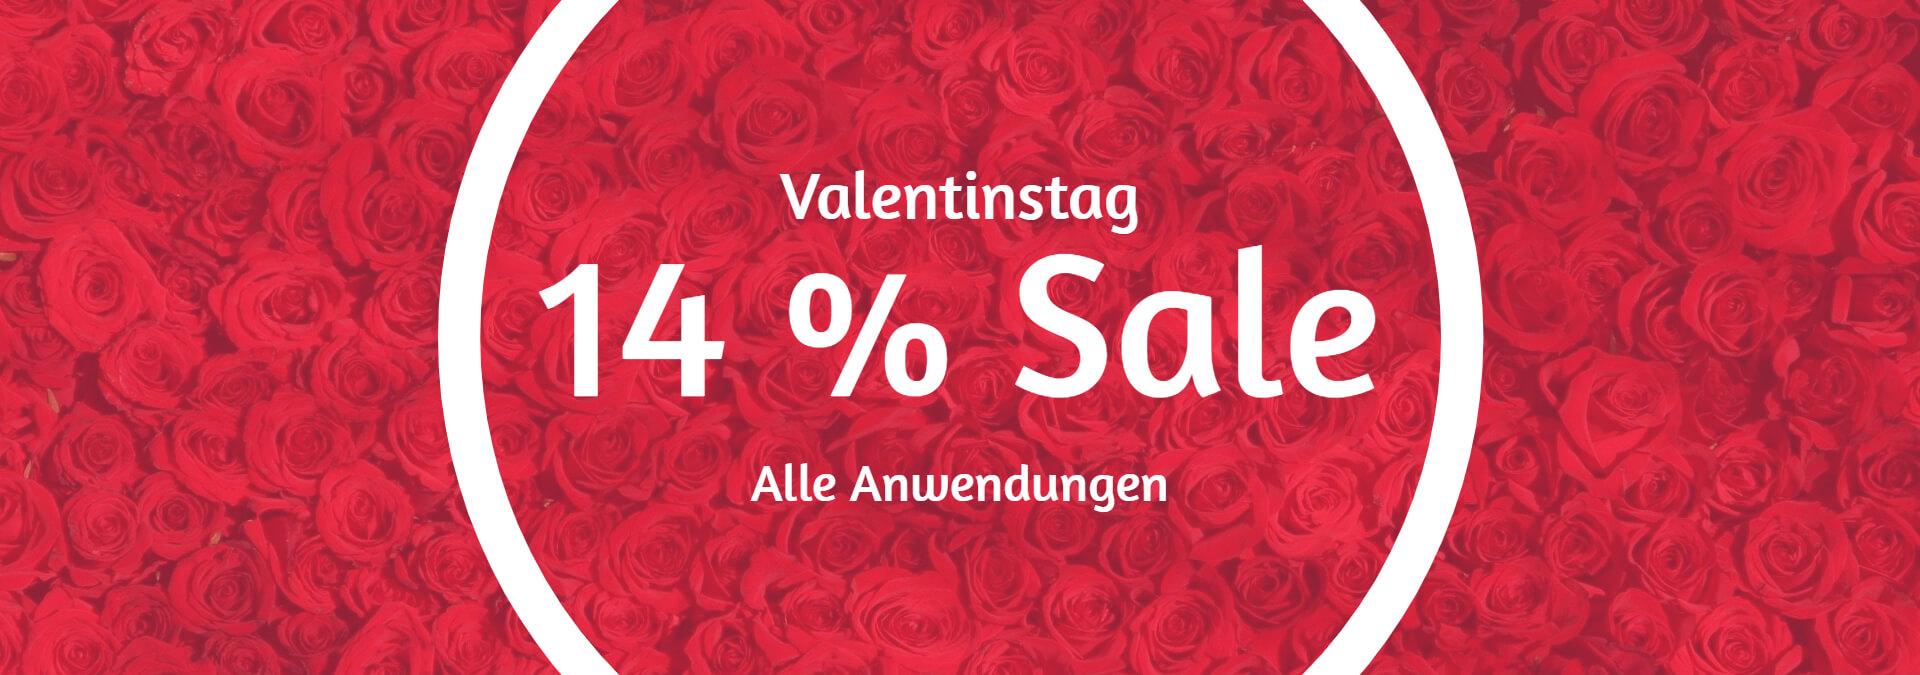 Valentinstag Aktion Homepage (1)